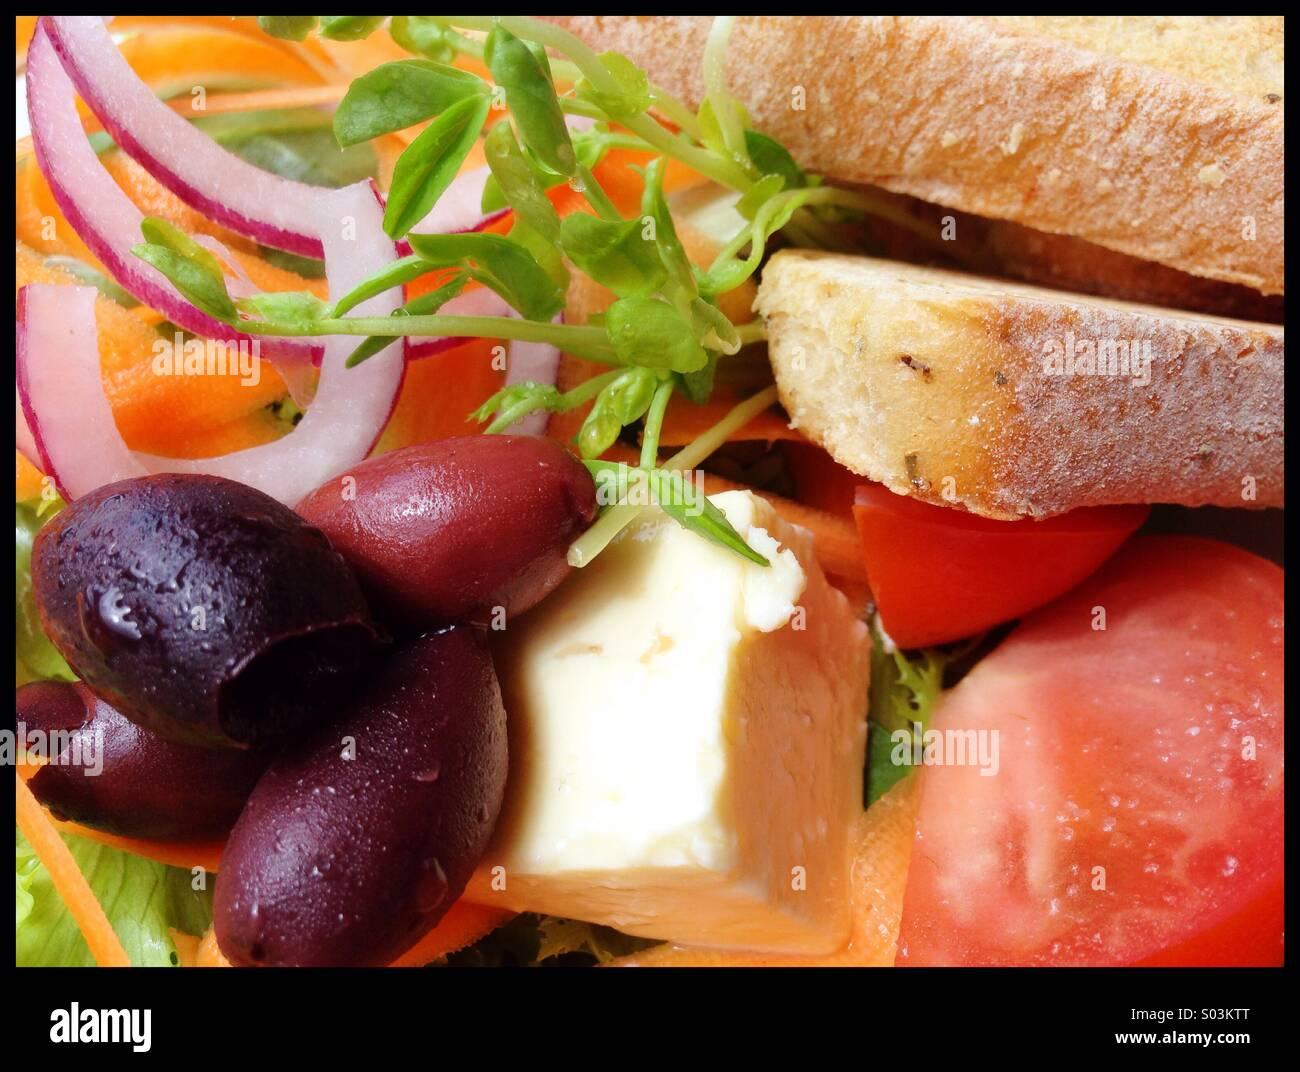 Salat und Brot Stockfoto